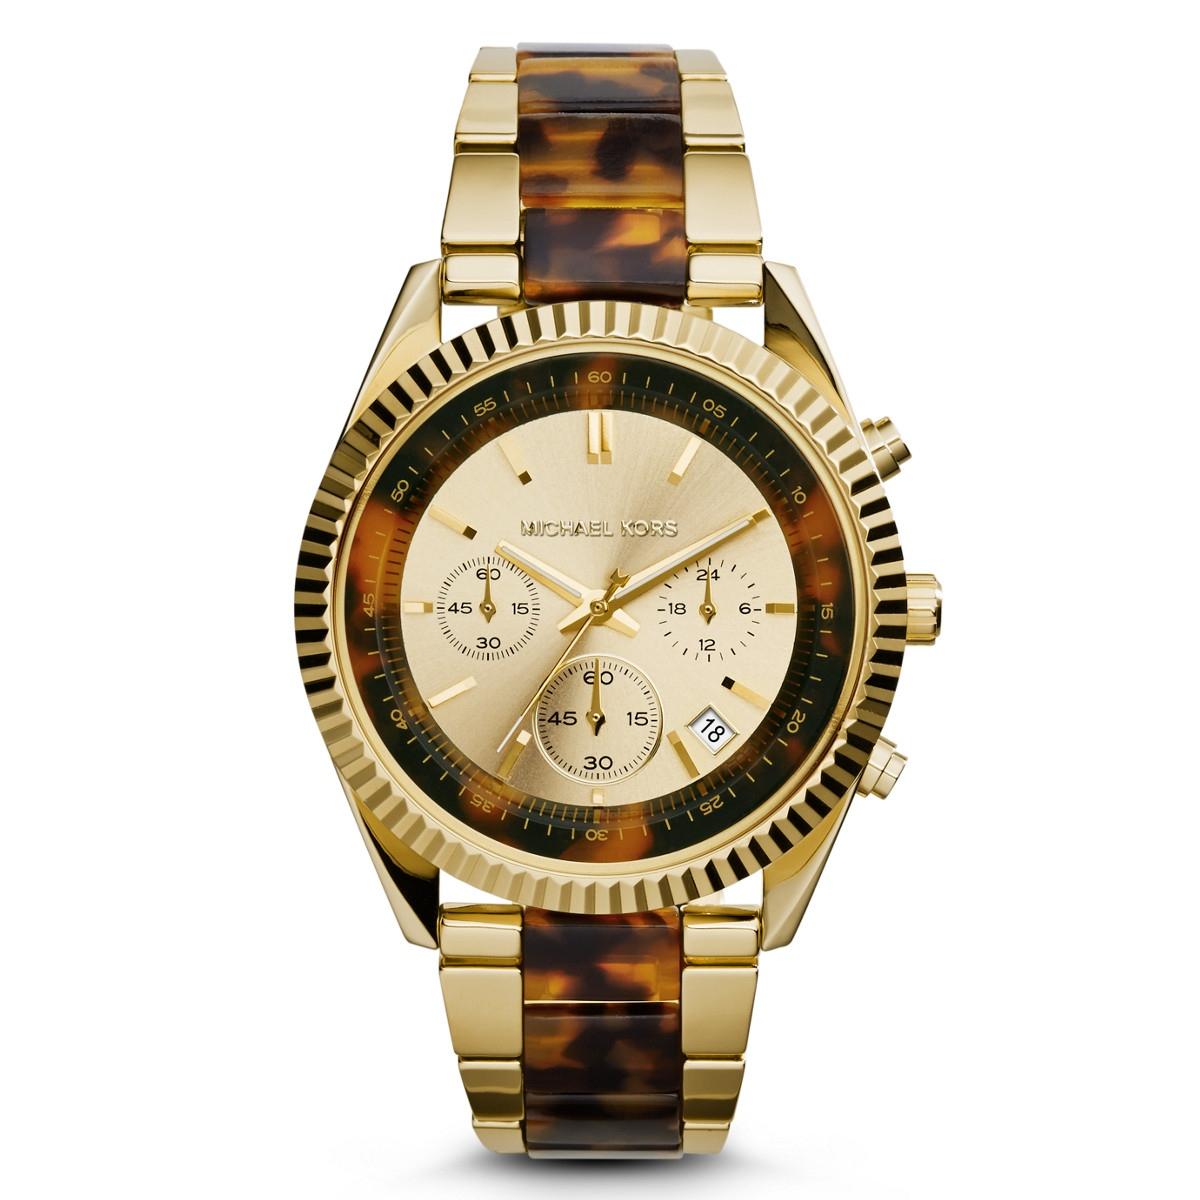 называется уметь часы michael kors официальный сайт цены на 2016 год выбор